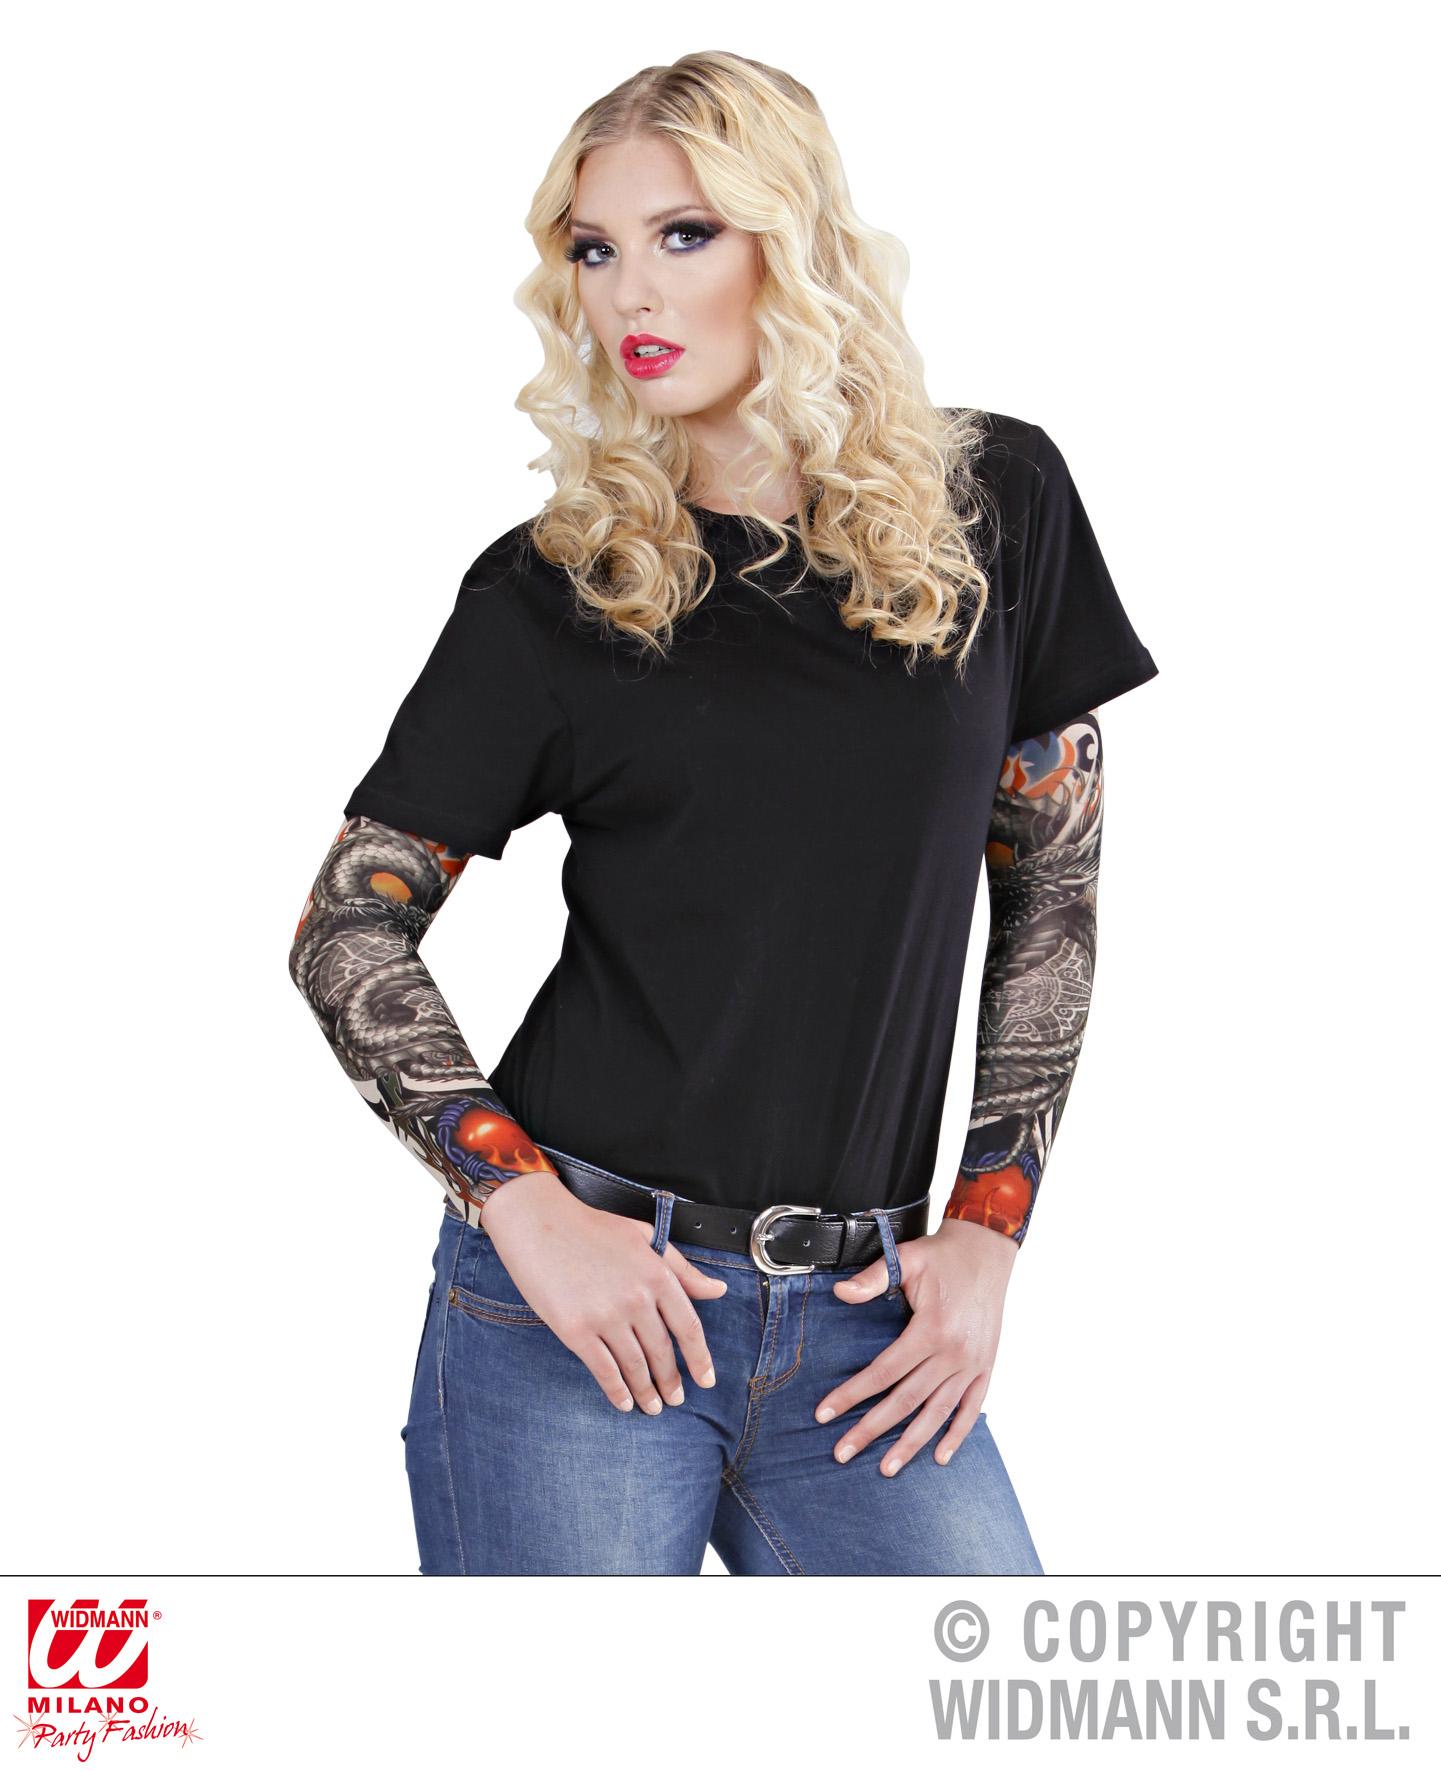 2x arm tattoo strumpf rmel schlange horro figur gag. Black Bedroom Furniture Sets. Home Design Ideas